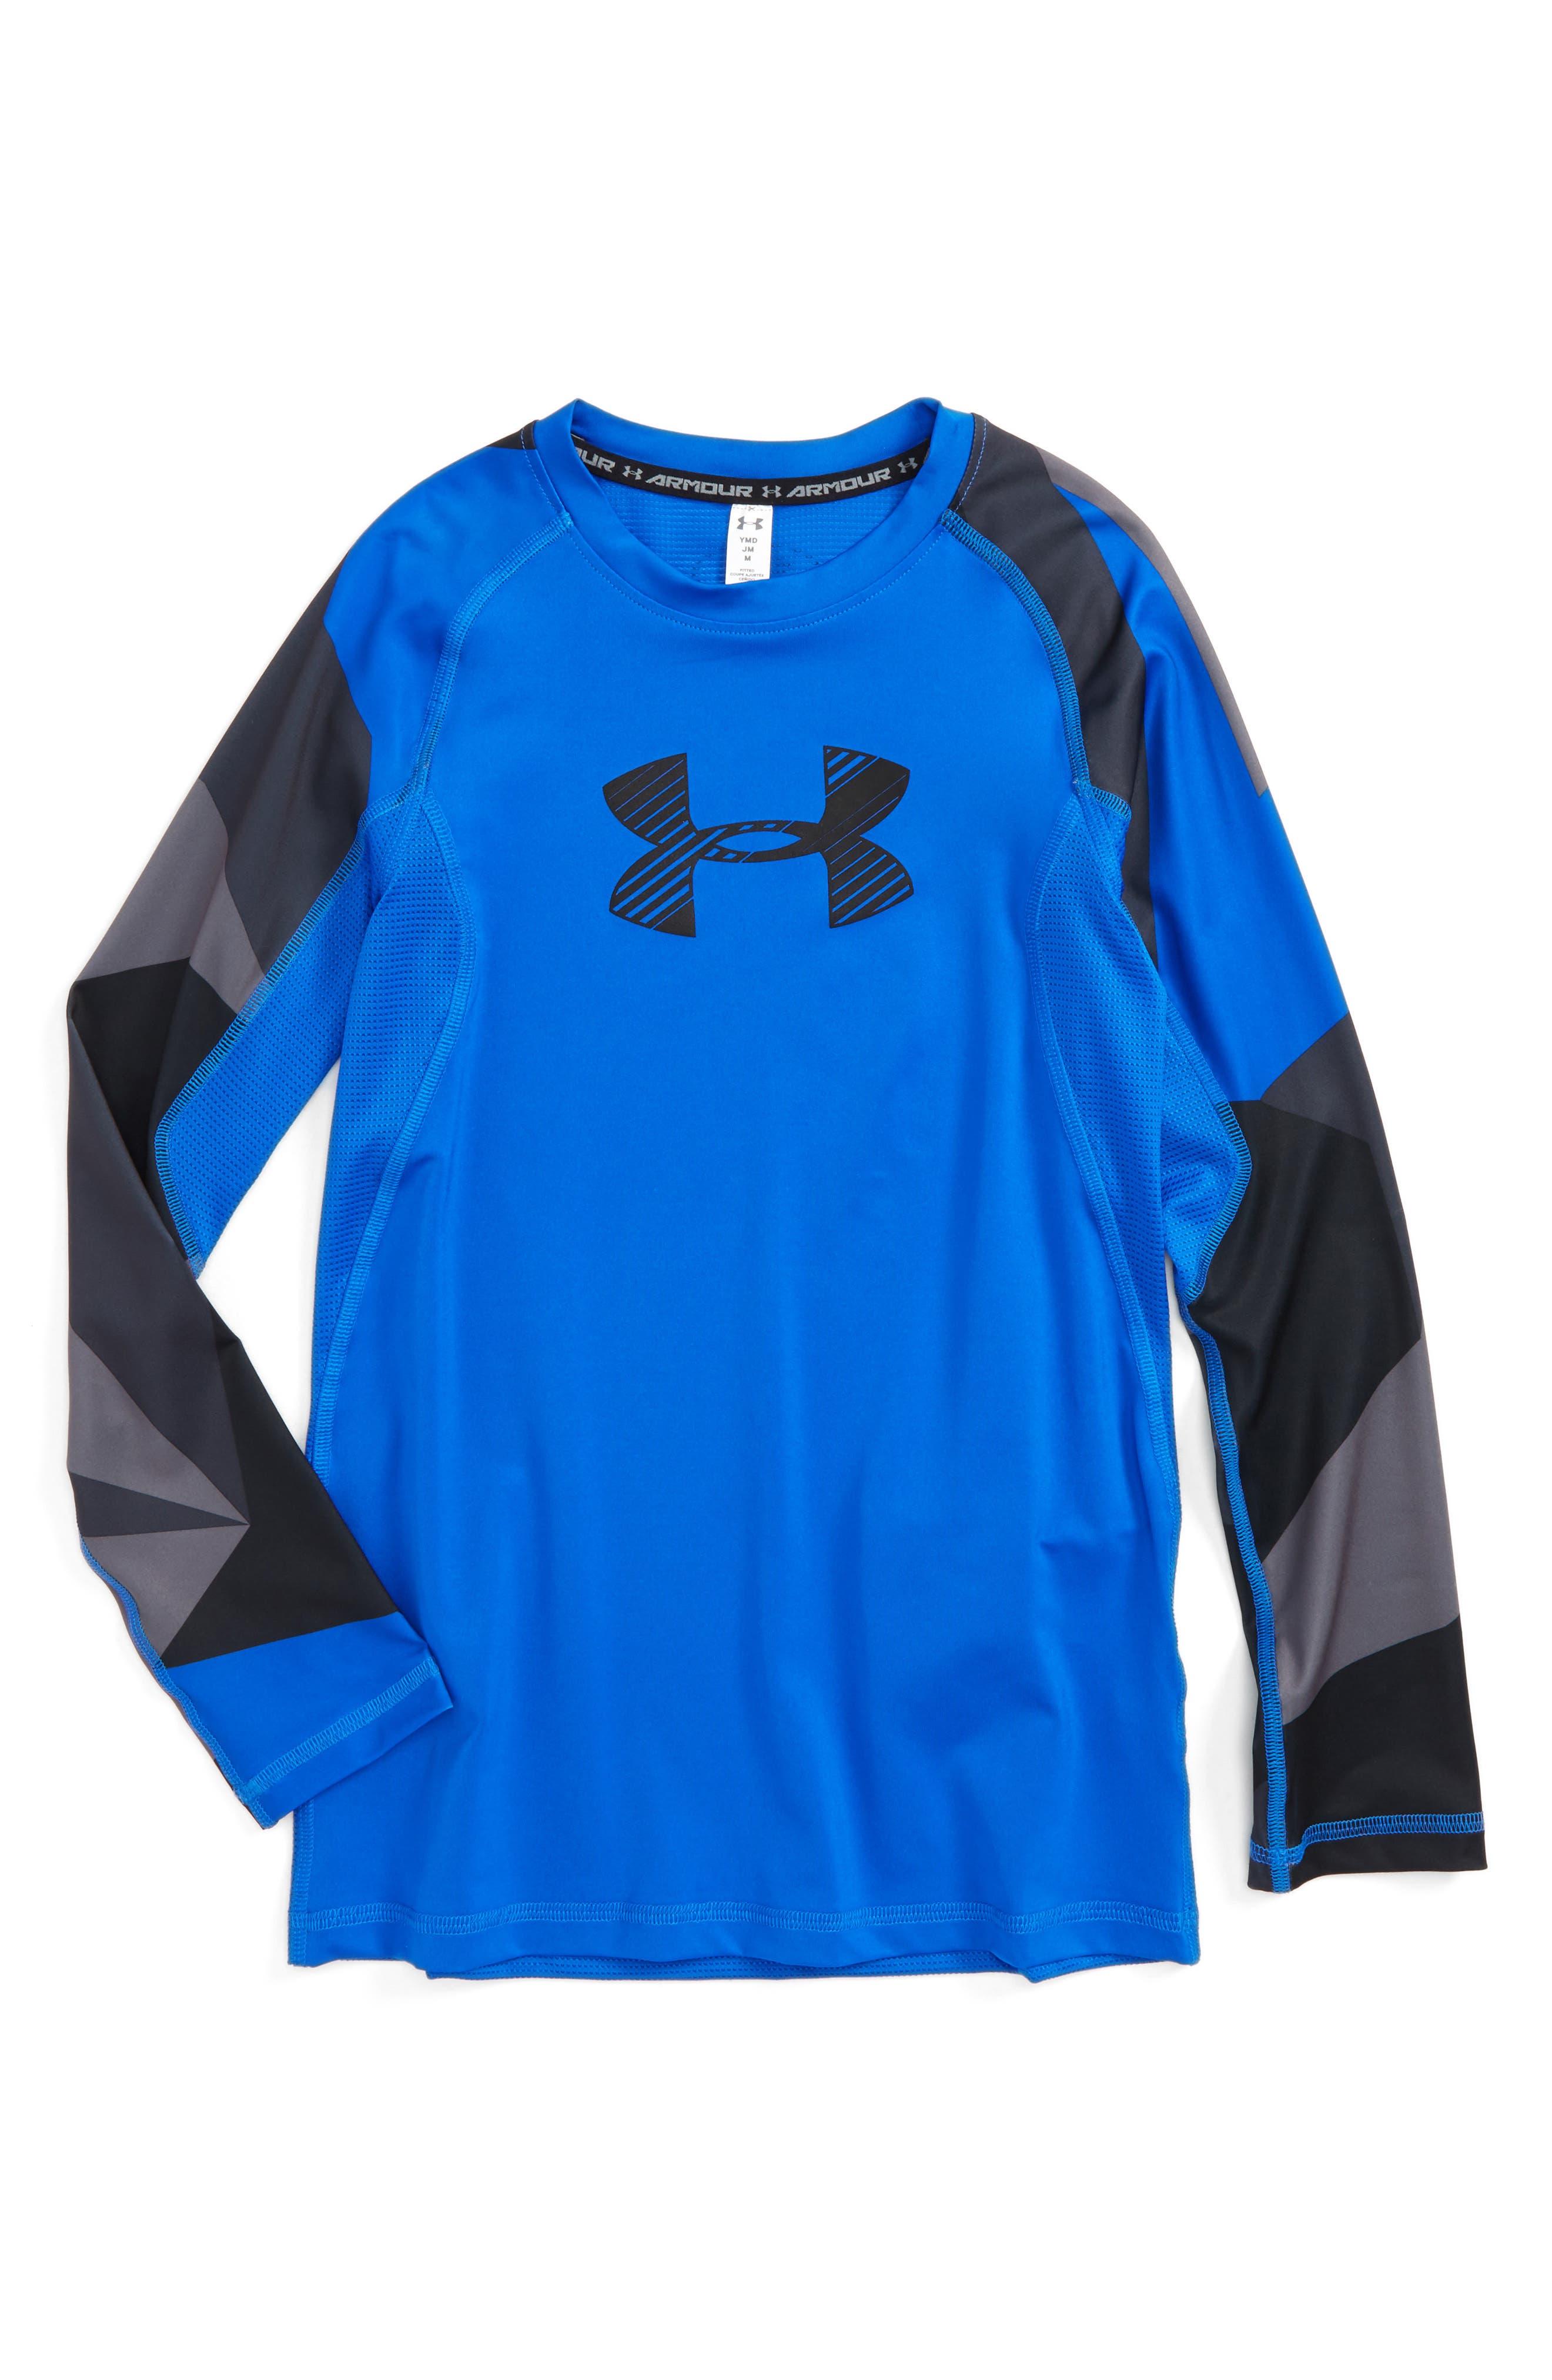 Novelty HeatGear<sup>®</sup> Shirt,                             Main thumbnail 1, color,                             Ultra Blue/ Black